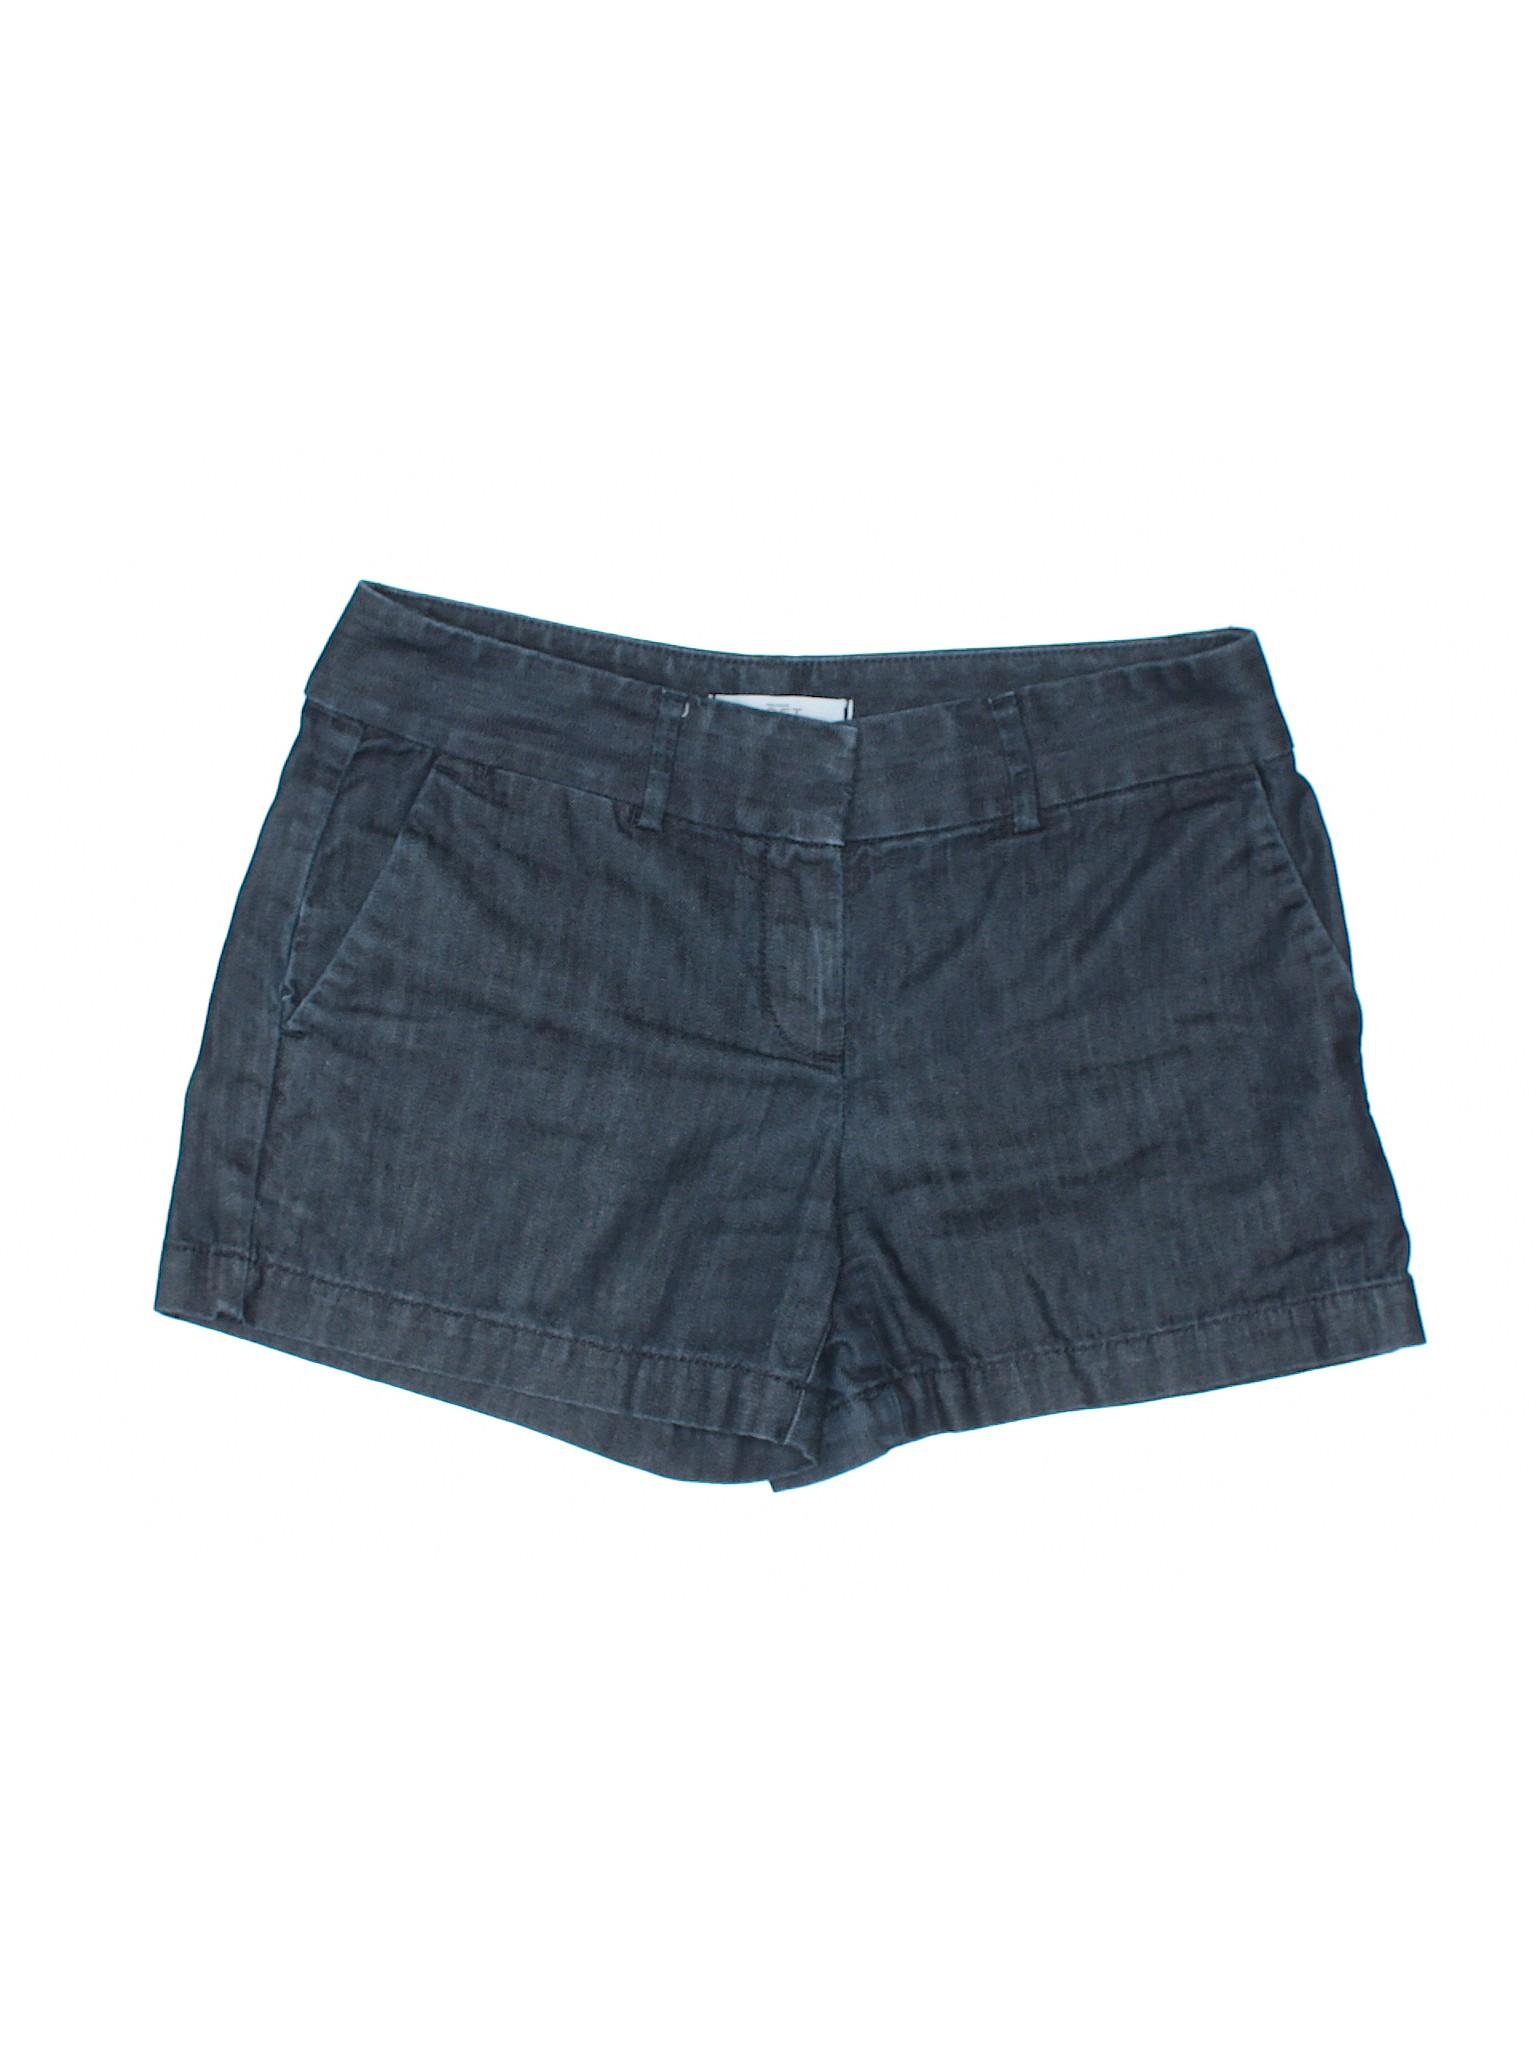 Denim Shorts Taylor Ann Boutique LOFT qXz00w